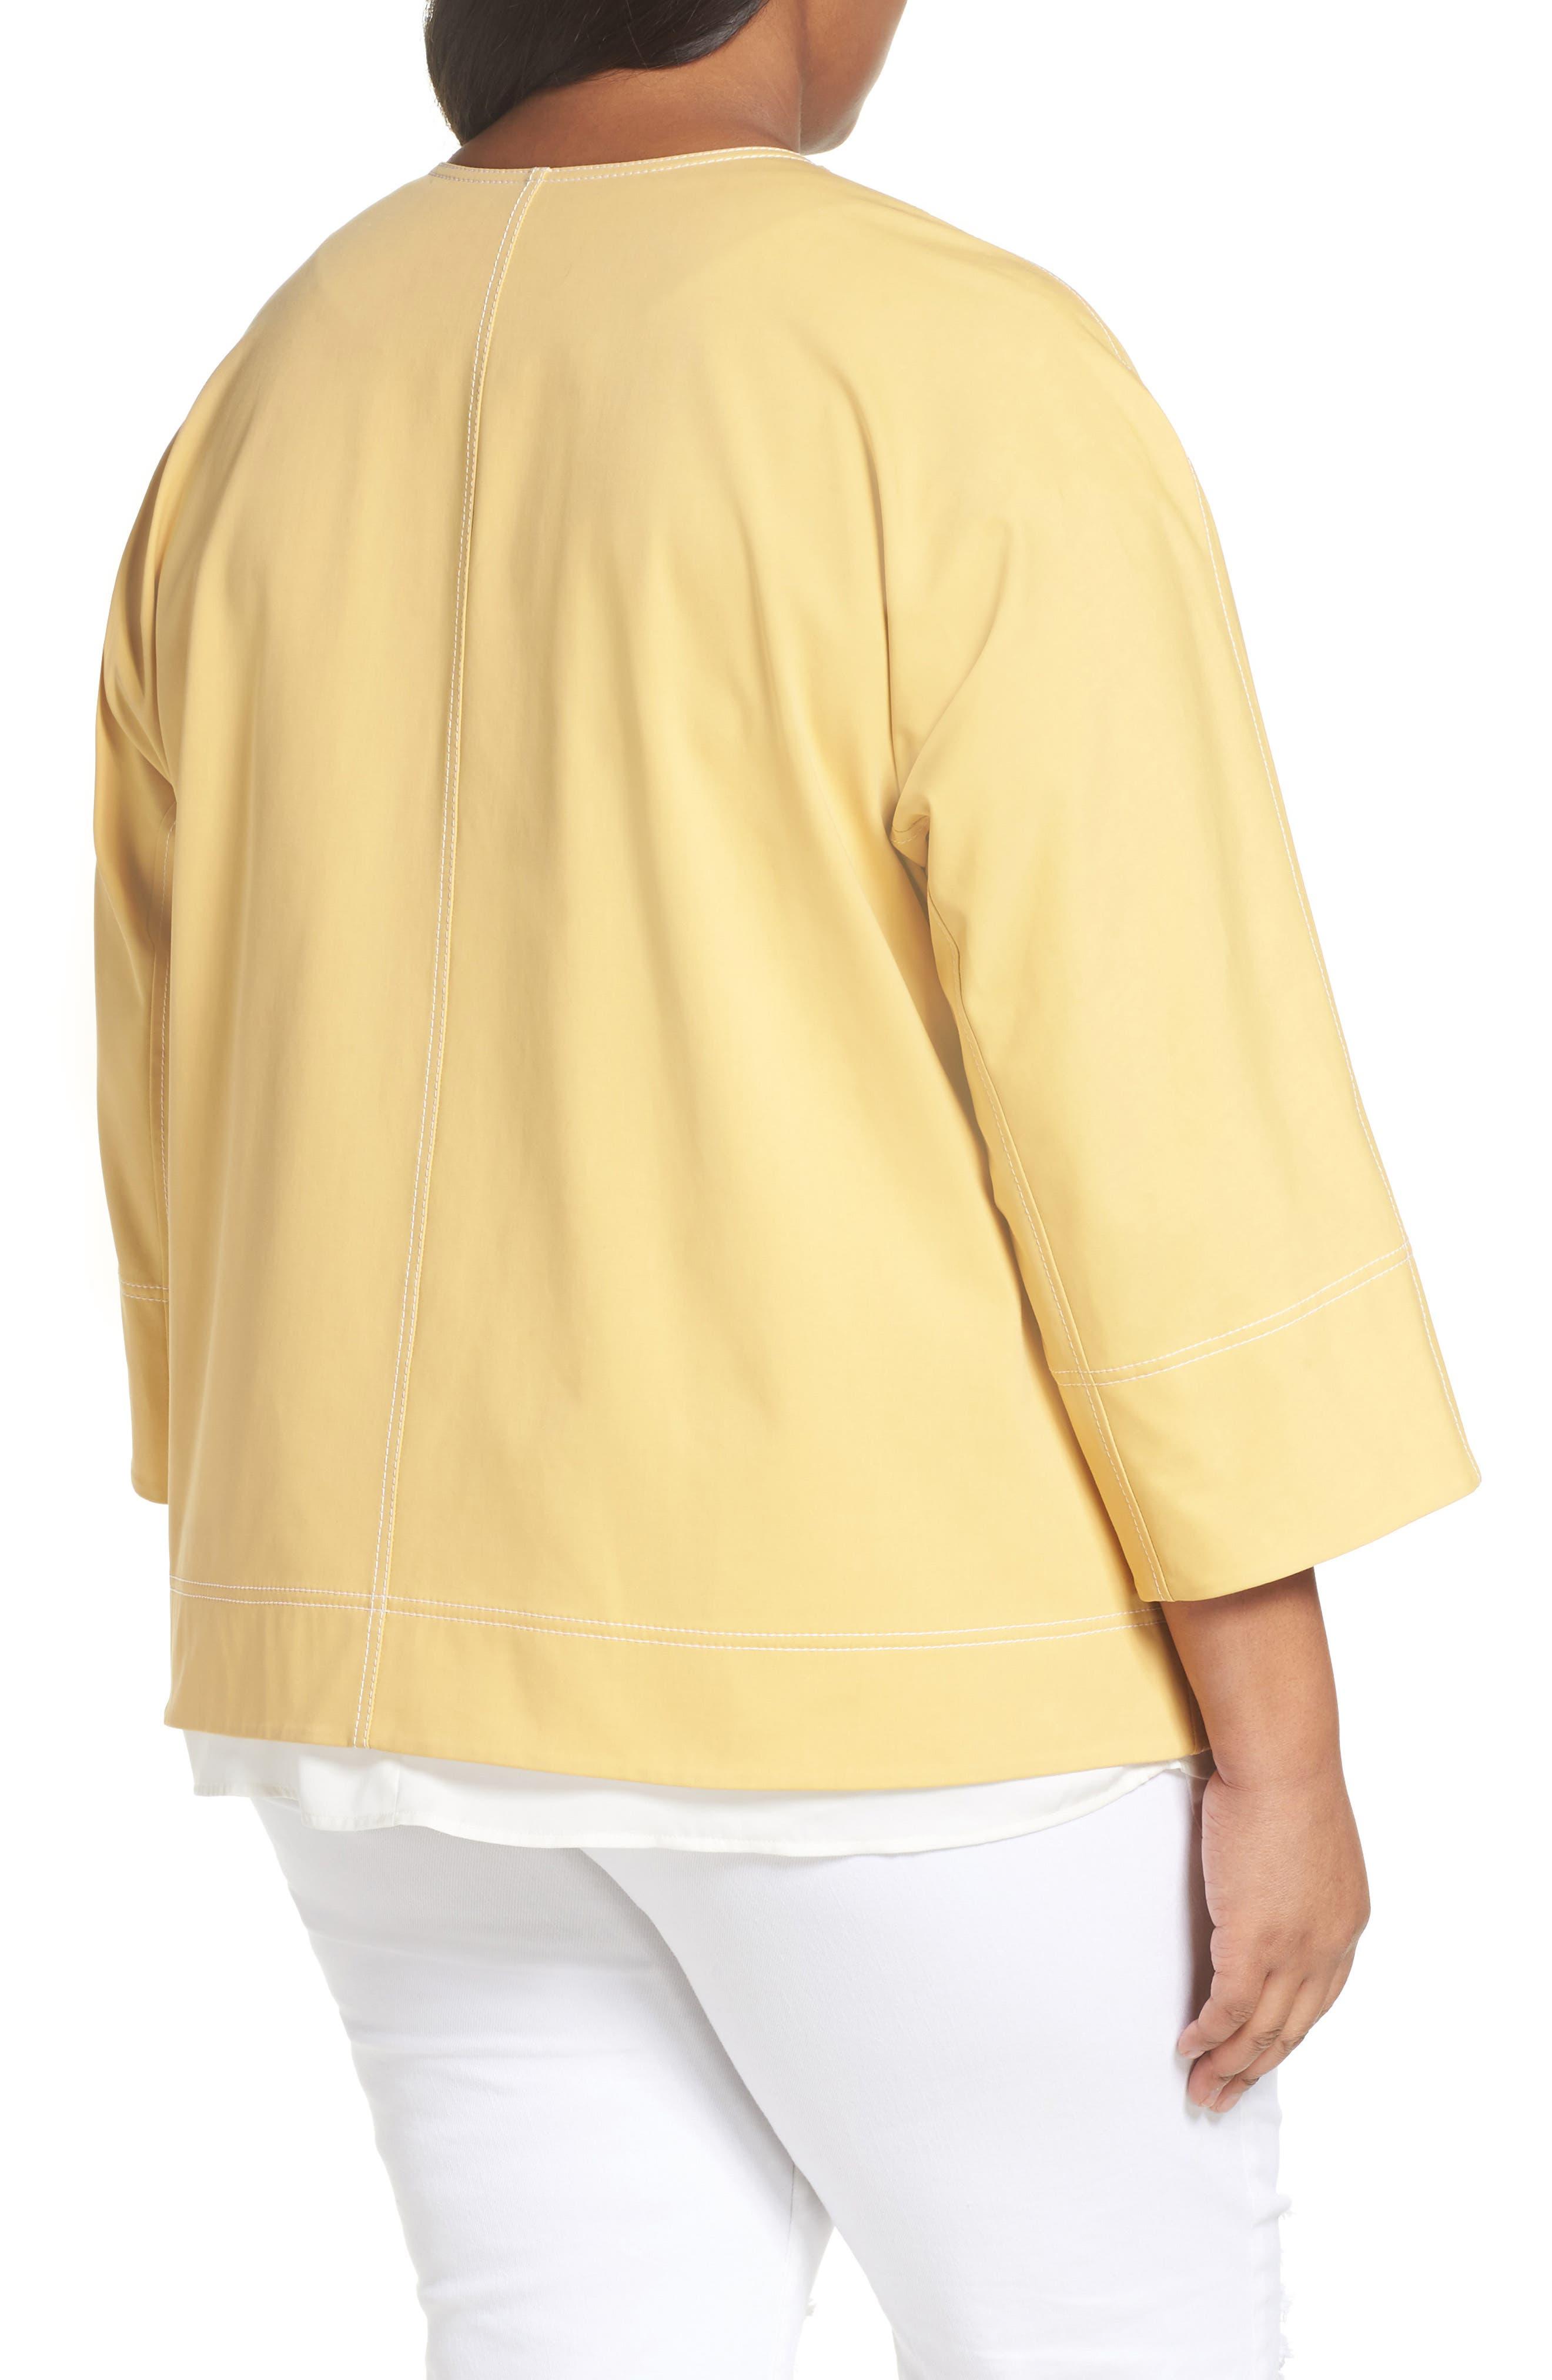 Milo Zip Jacket,                             Alternate thumbnail 2, color,                             Sienna Yellow